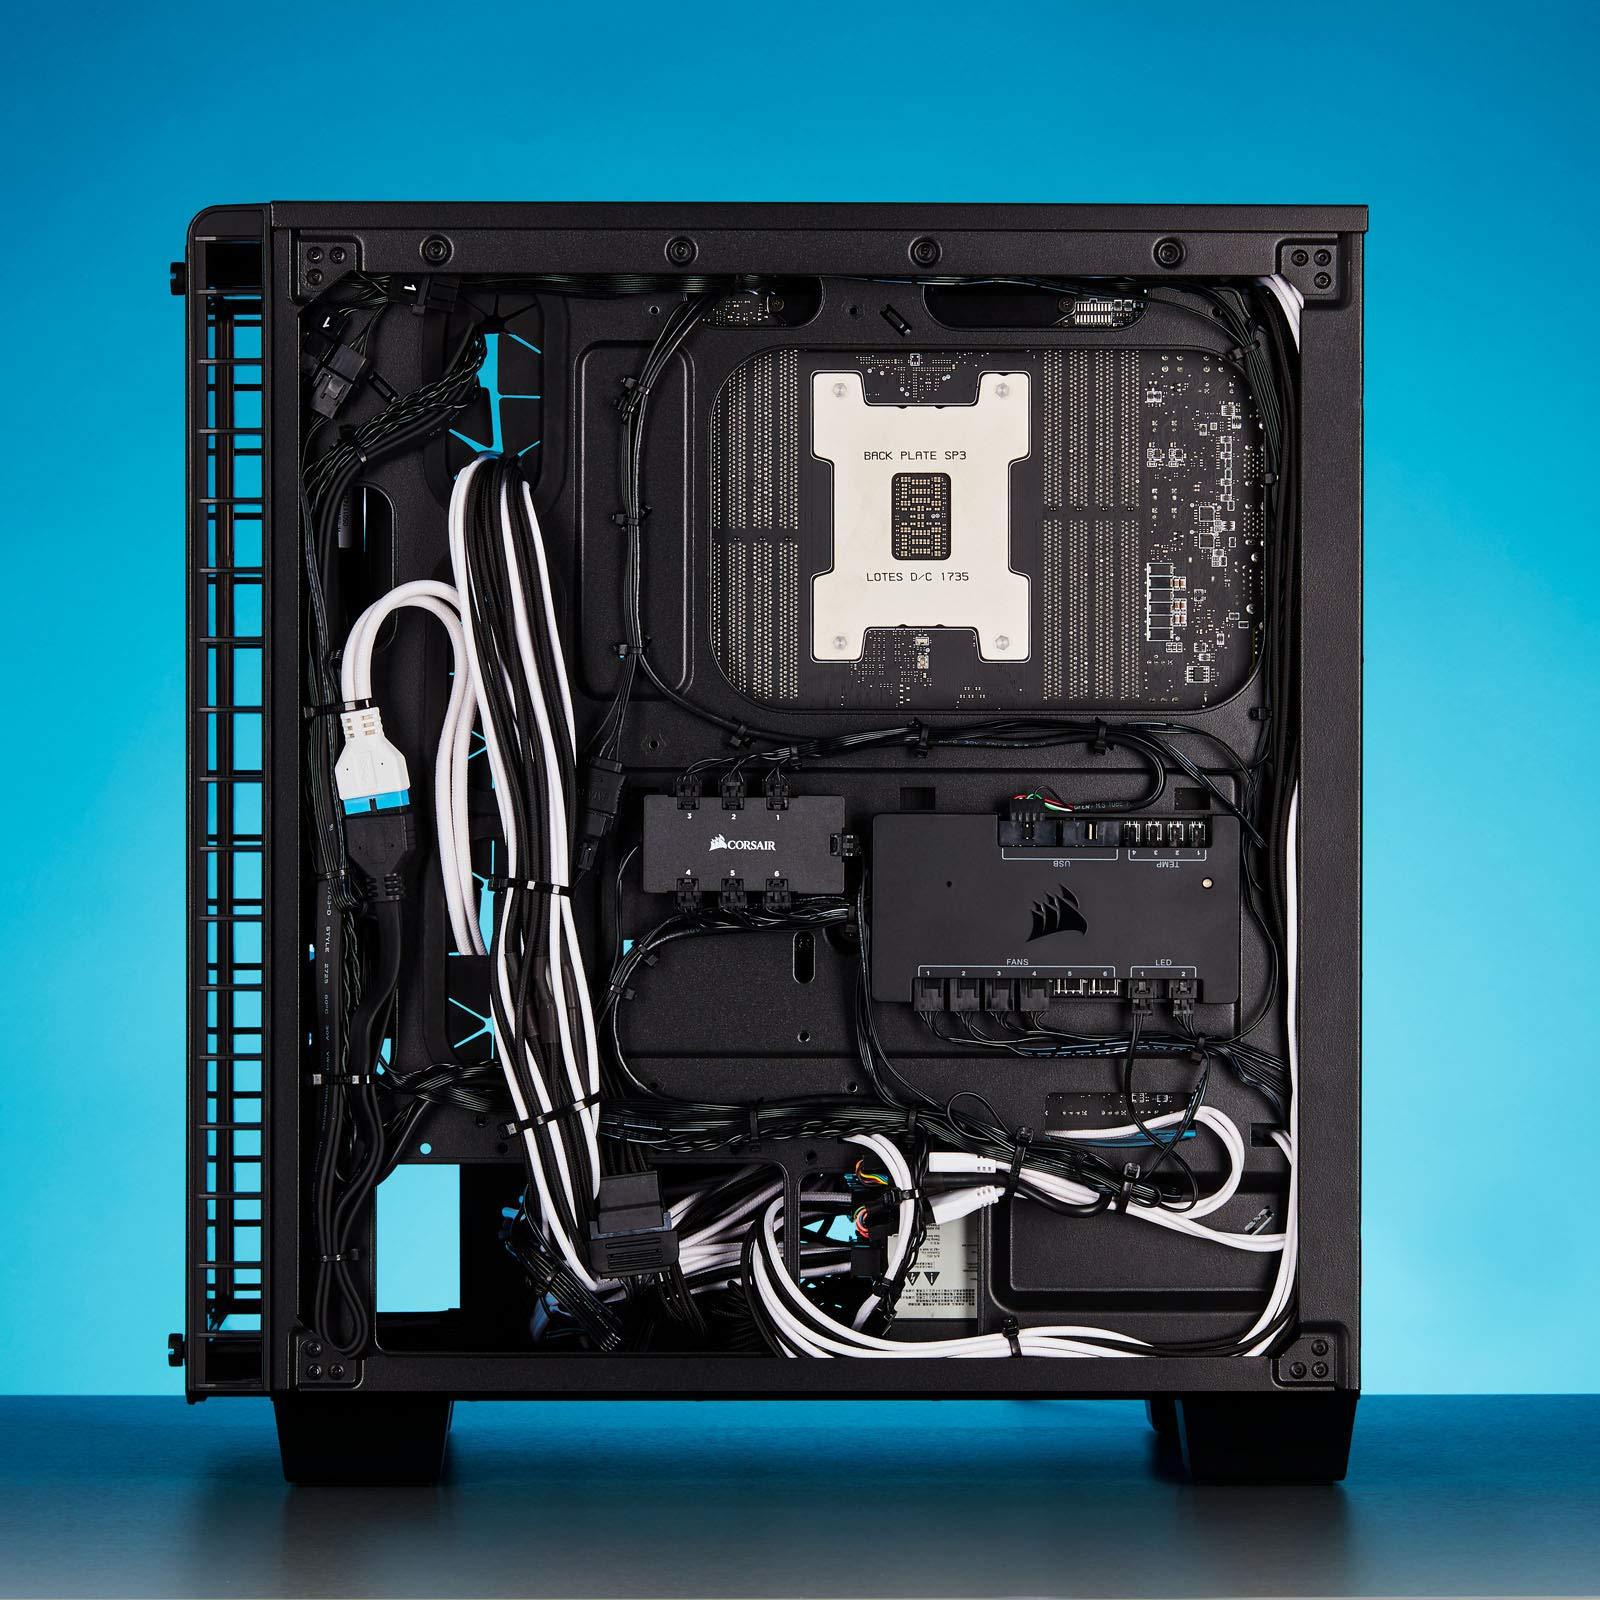 CORSAIR Premium Individually Sleeved PSU Cables Starter Kit - Black, 2 Yr Warranty, for Corsair PSUs by Corsair (Image #13)